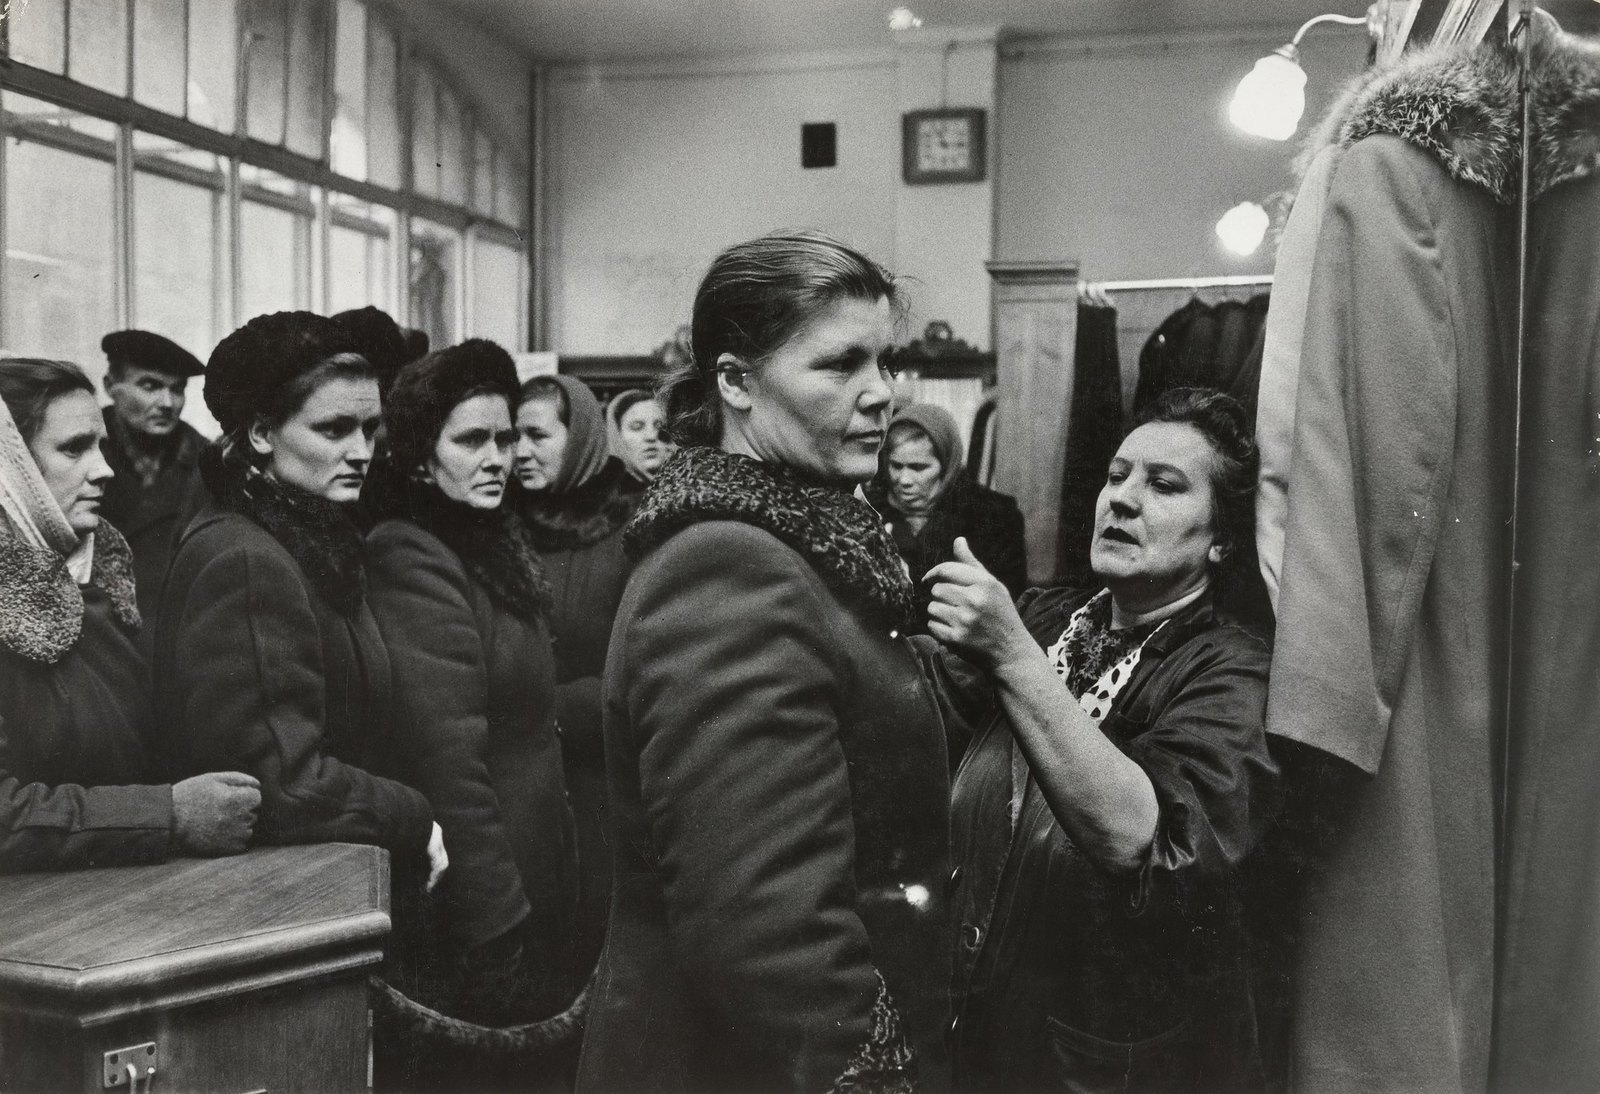 1957. Ленинград. Универмаг